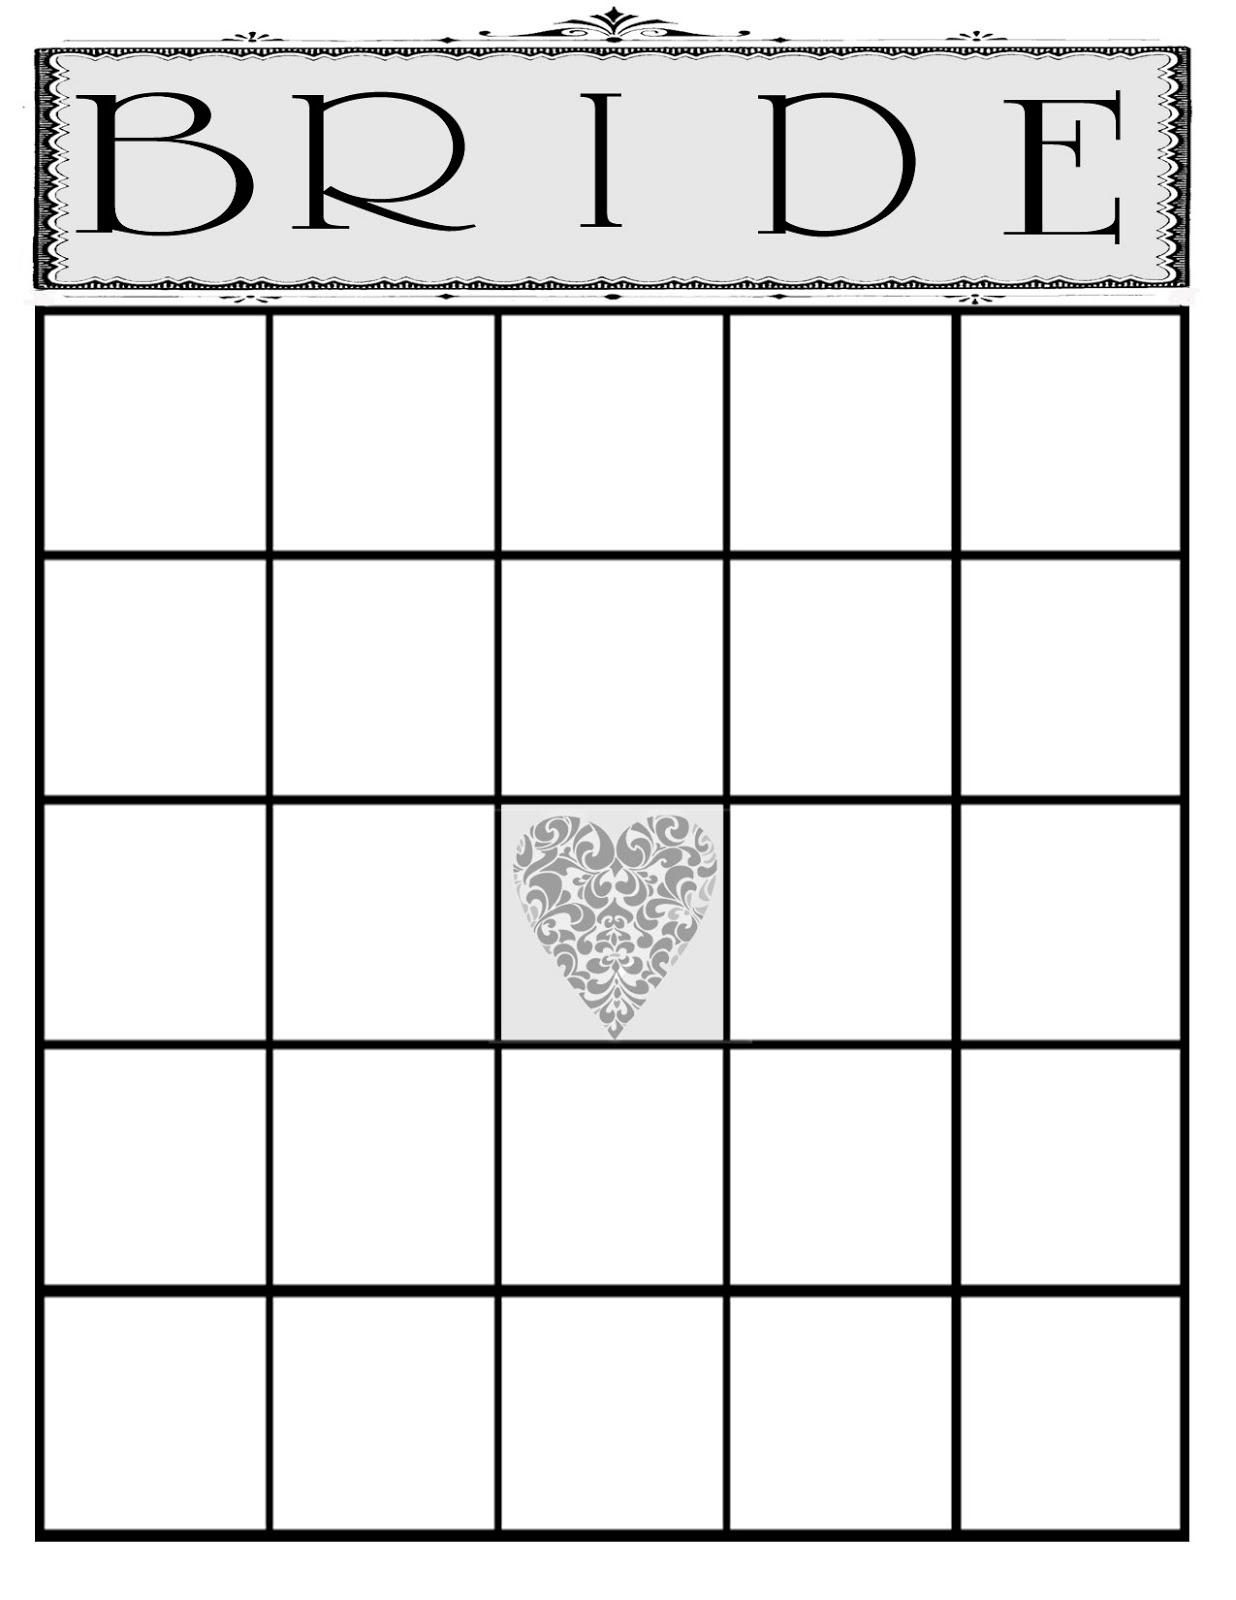 Blank Bingo Card Template 5x5